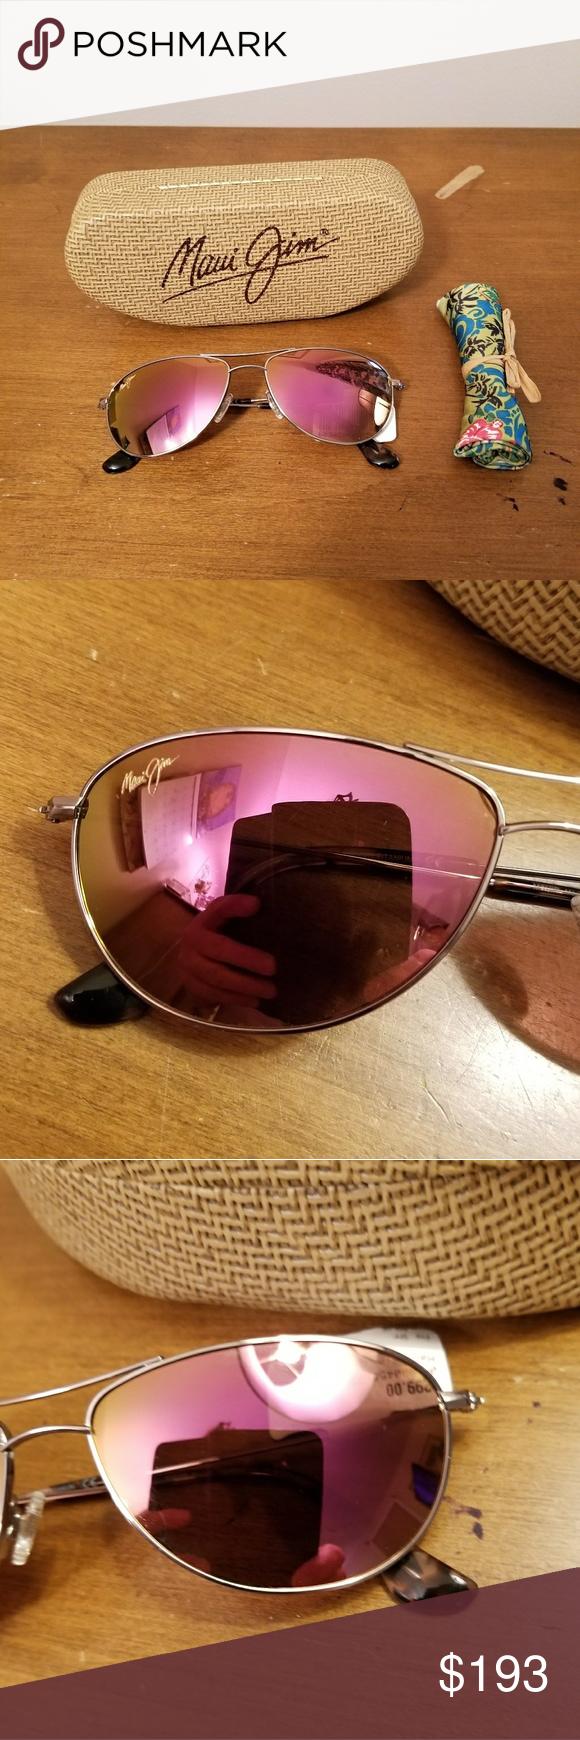 bc095a1e4a Maui Jim Baby Beach Polarized Sunglasses Frame  Rose Gold Lens  Maui  Sunrise Color Code  3560R4 Maui Jim Accessories Sunglasses